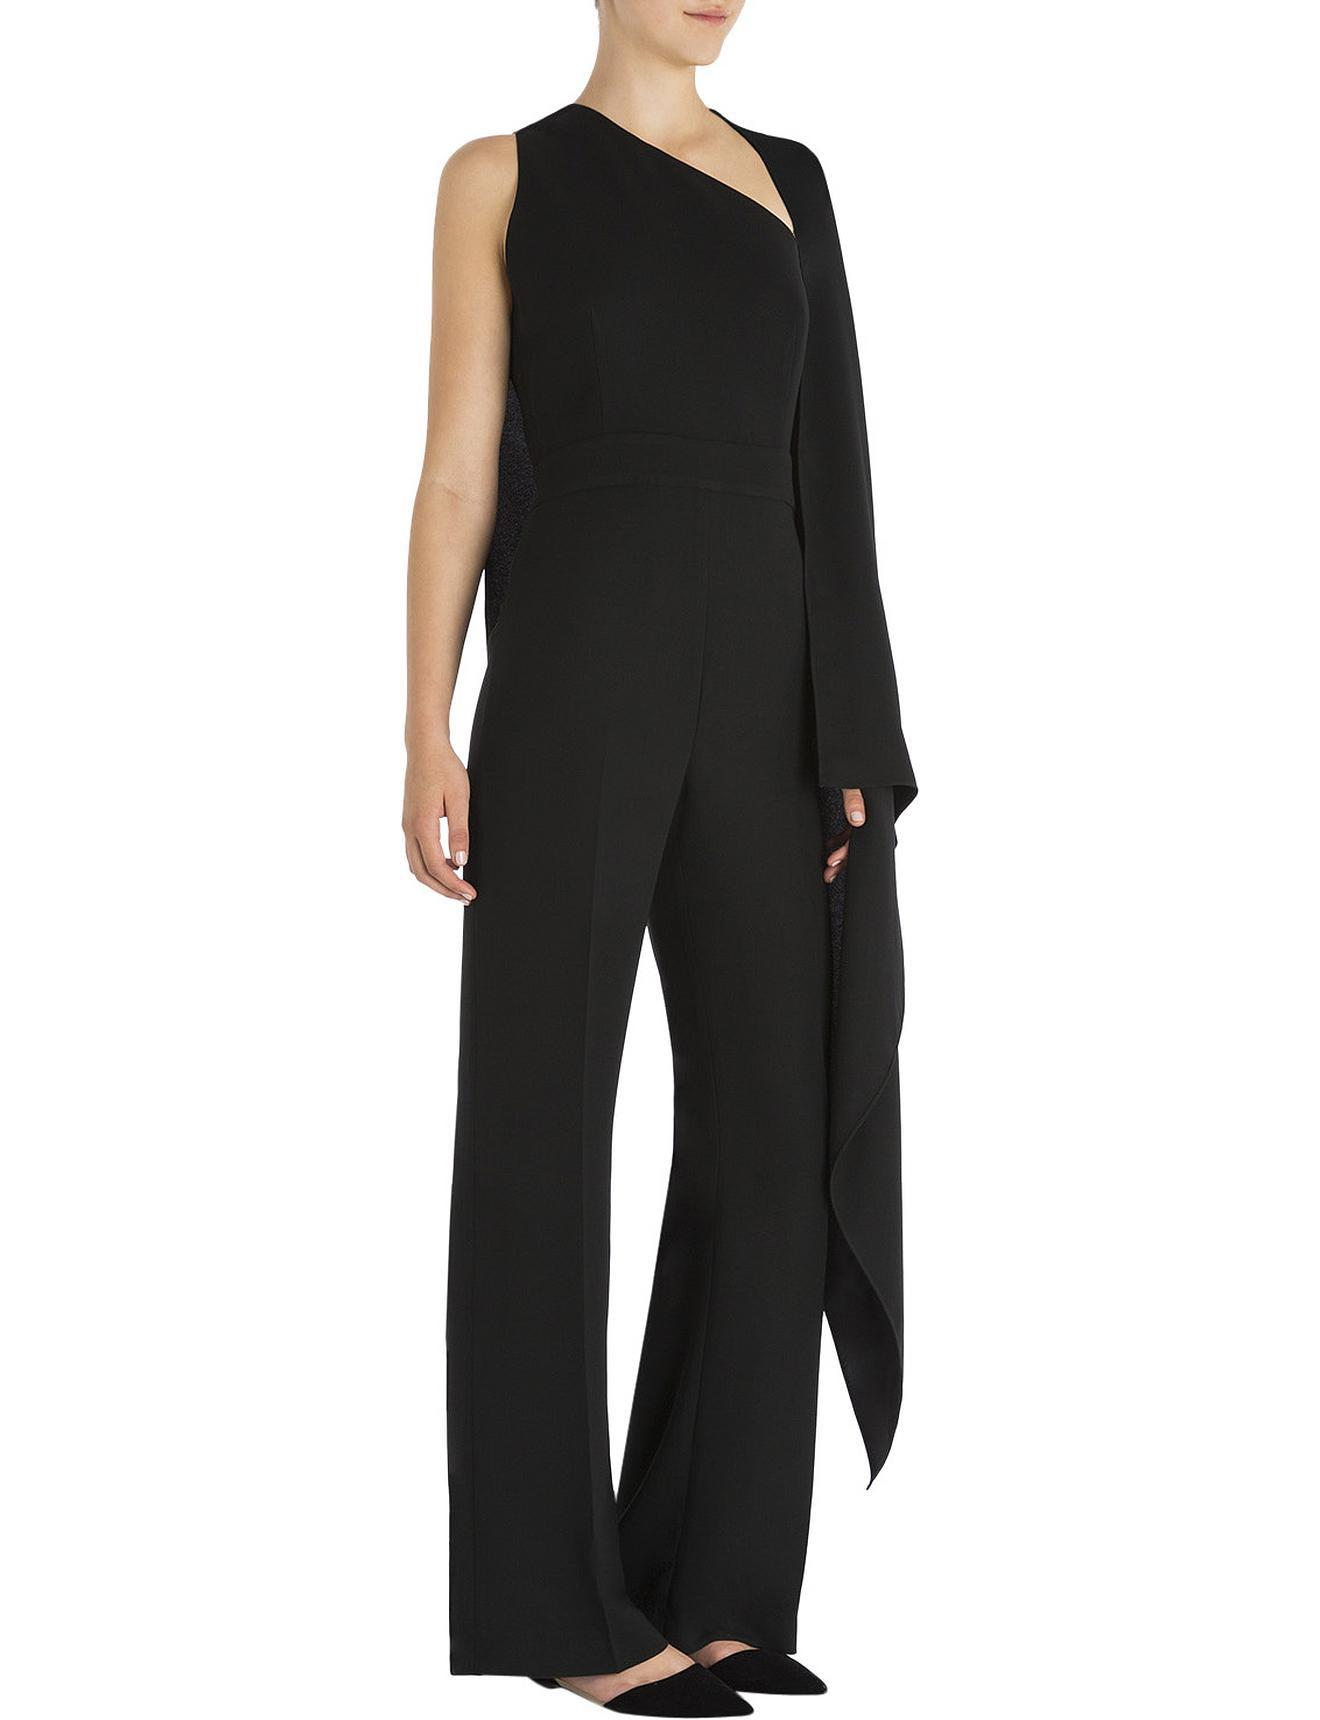 18ae85e625a Carla Zampatti Onyx Crepe Selene Caped Jumpsuit in Black - Lyst